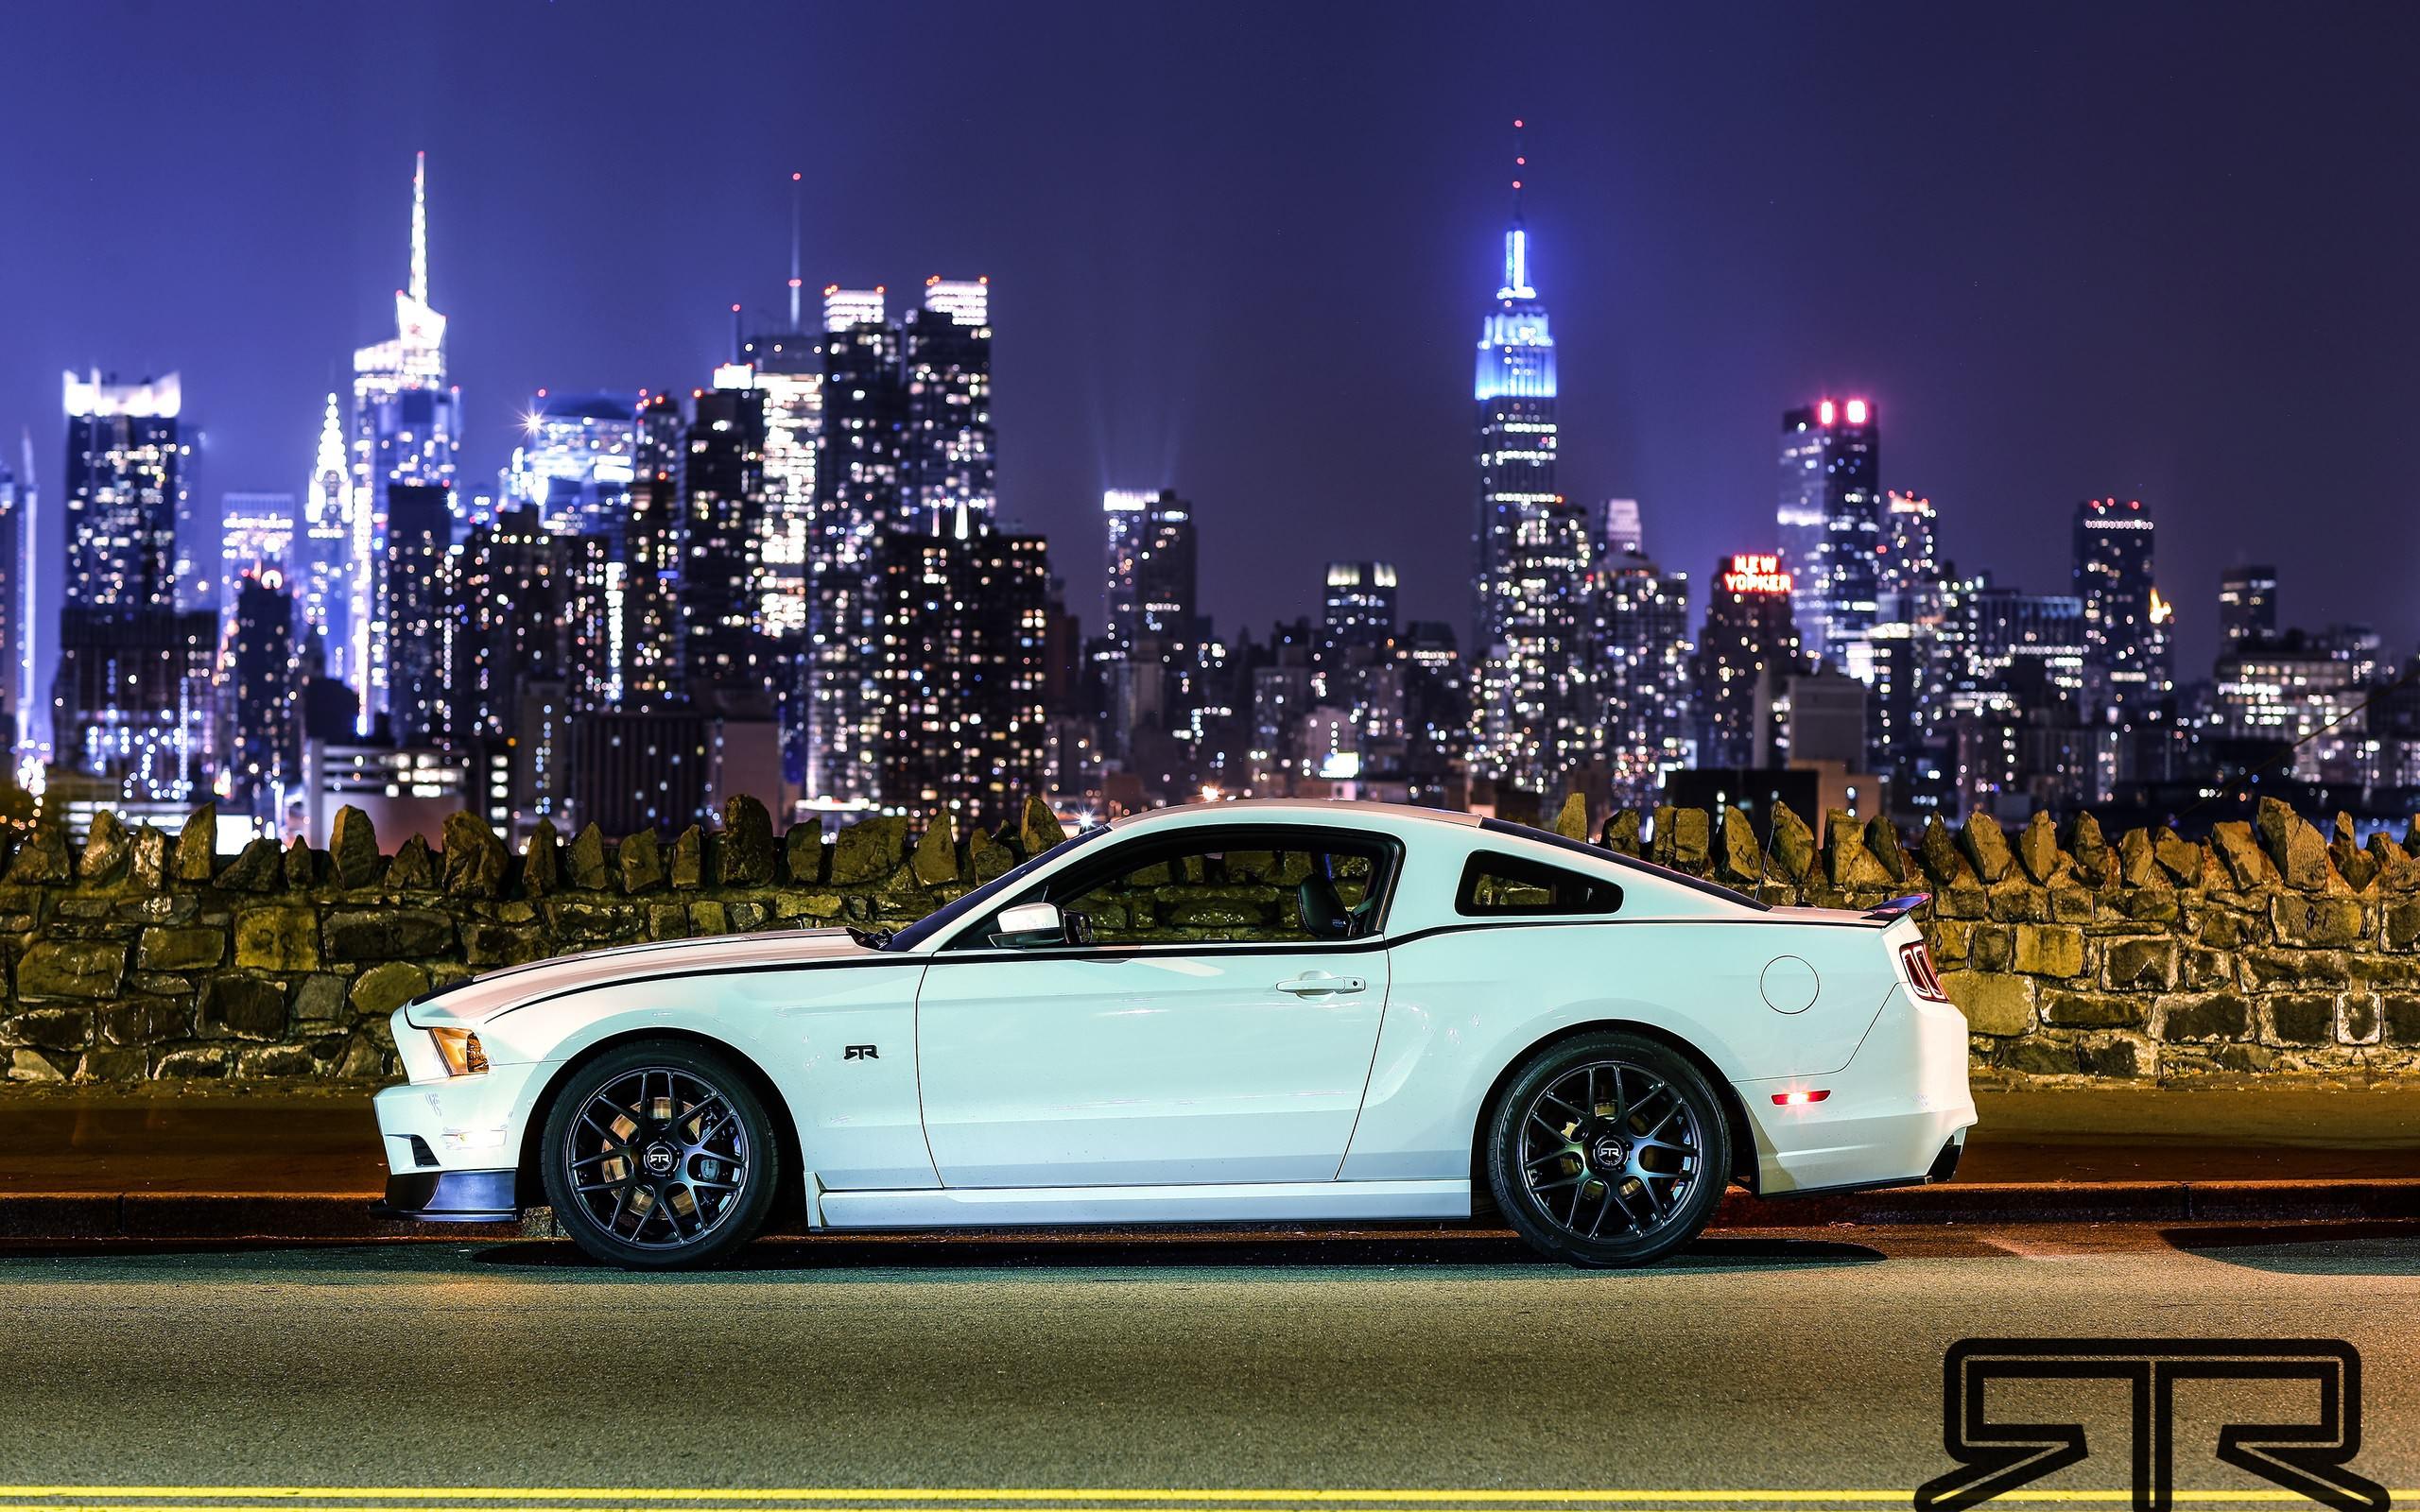 Ford Mustang дорога ночь бесплатно